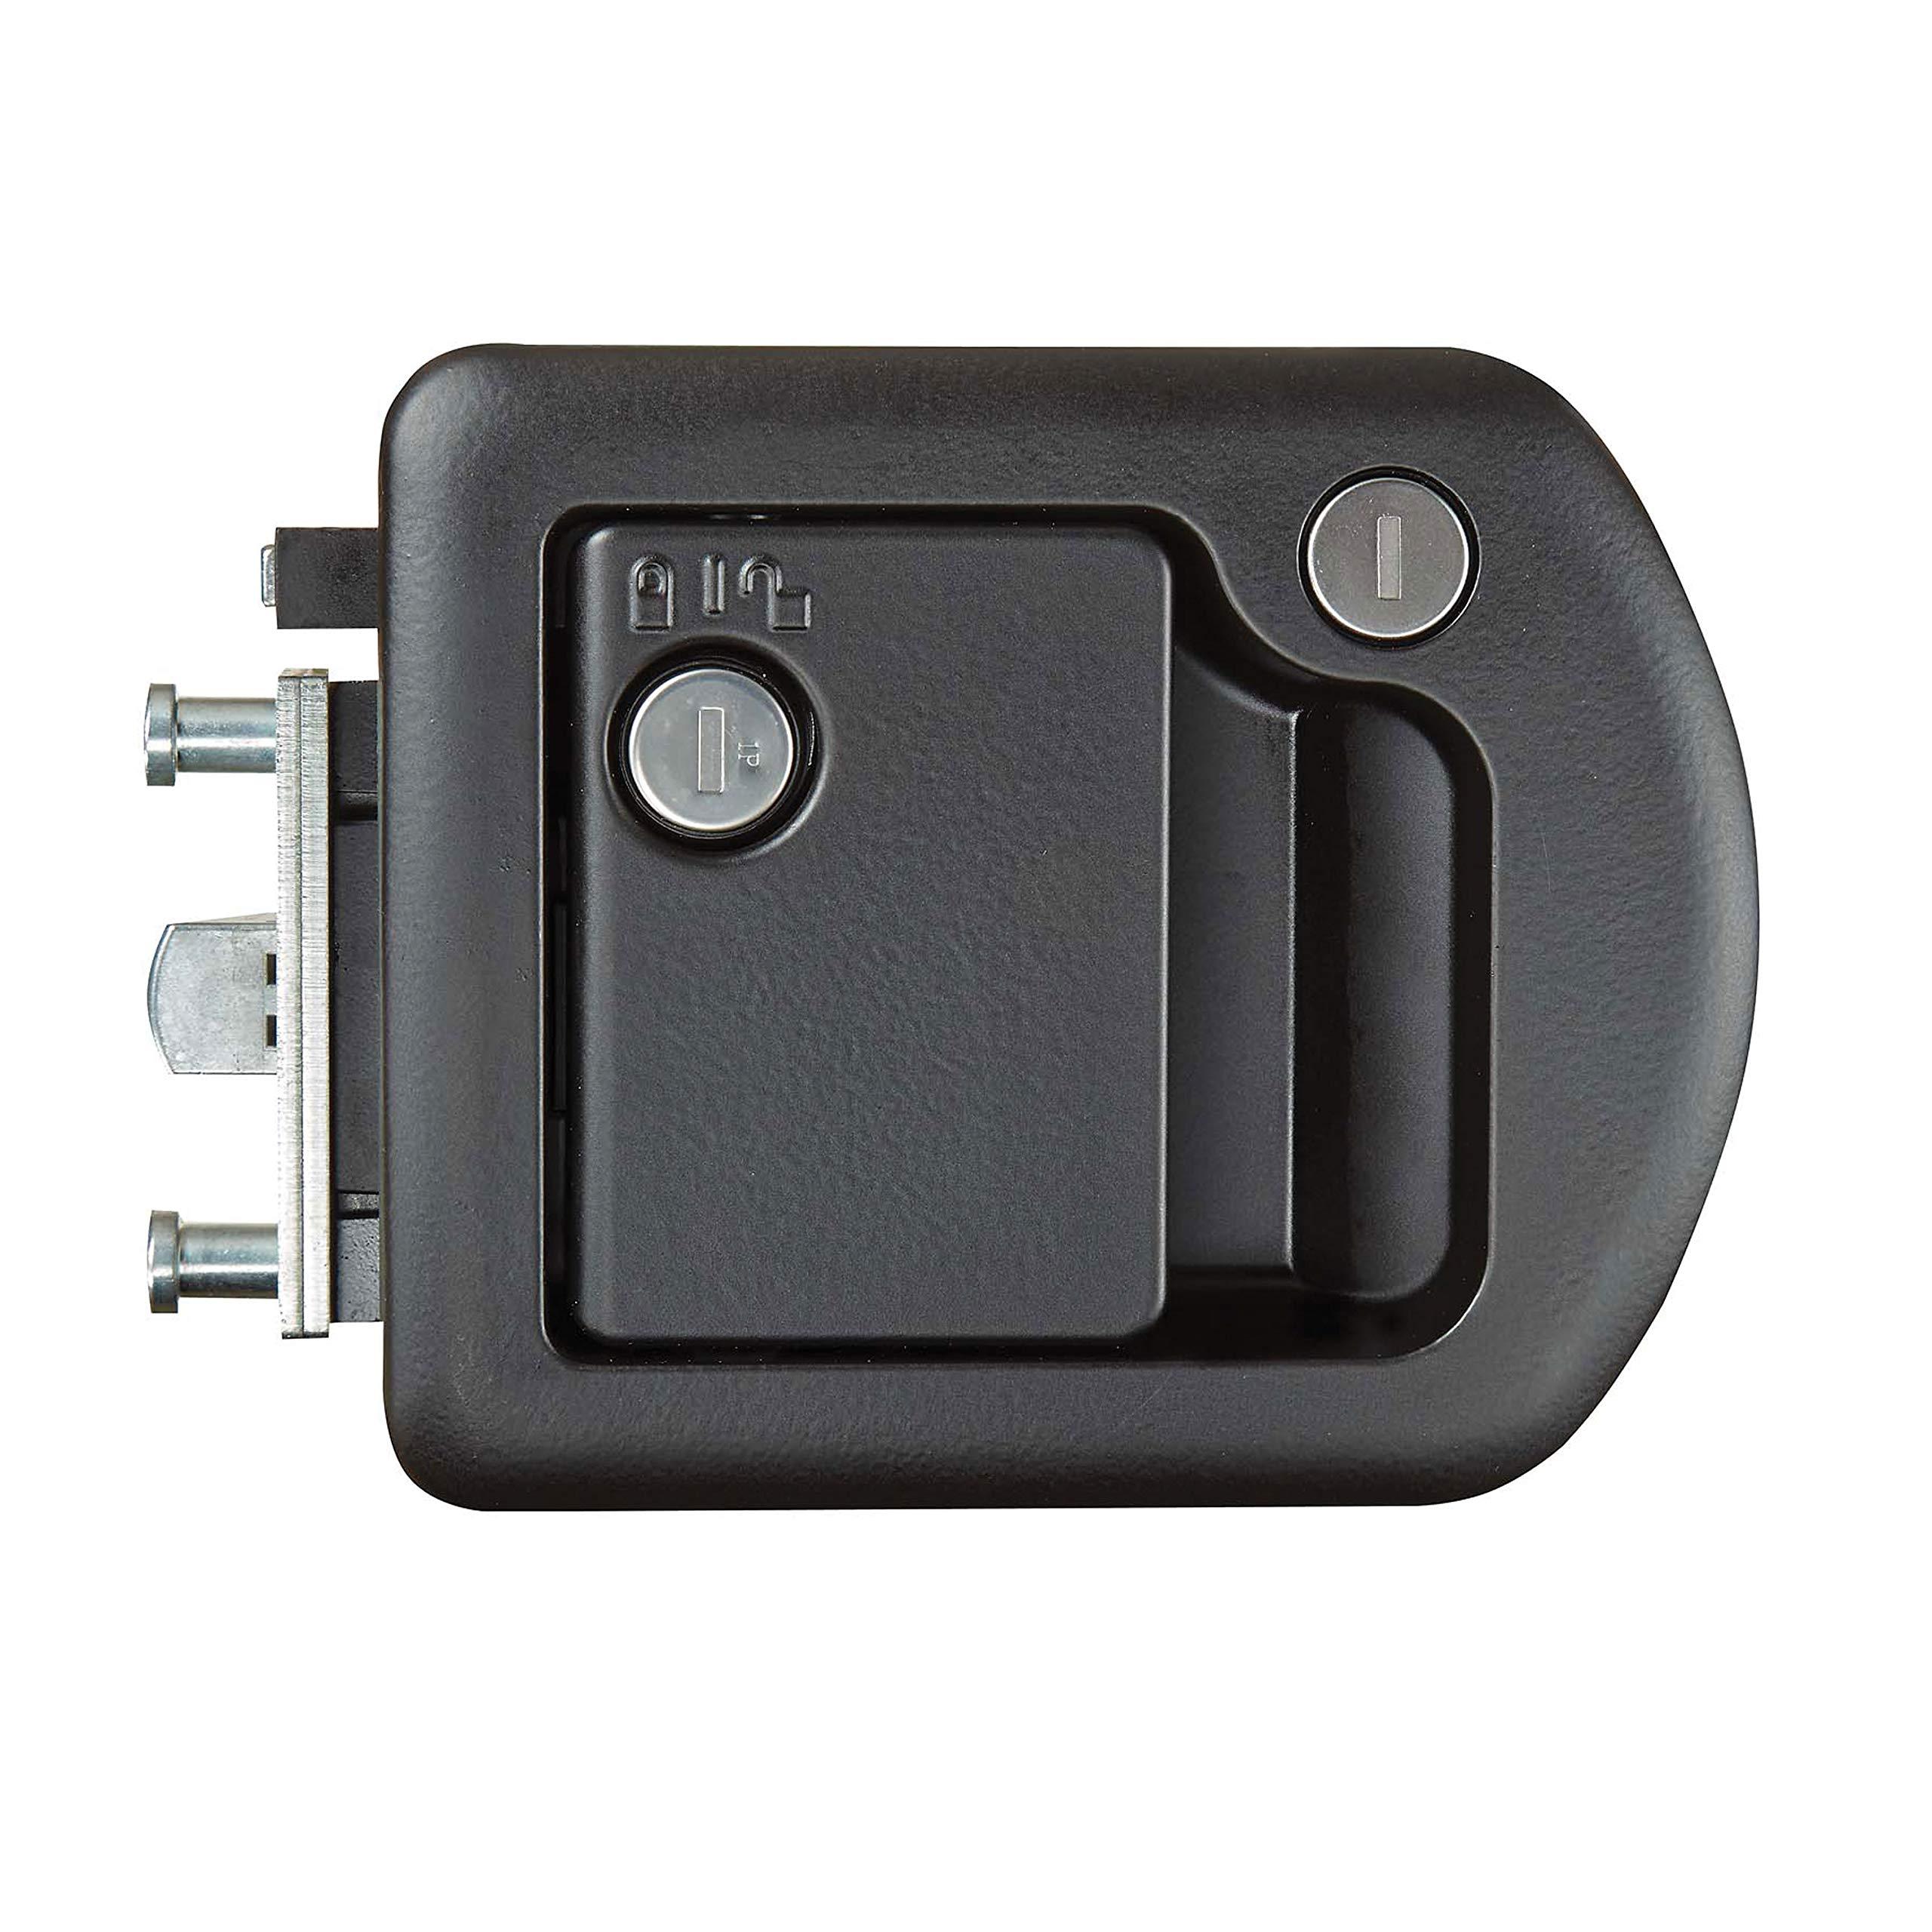 RV Designer Collection T507 Motor Home Entrance Door Lock